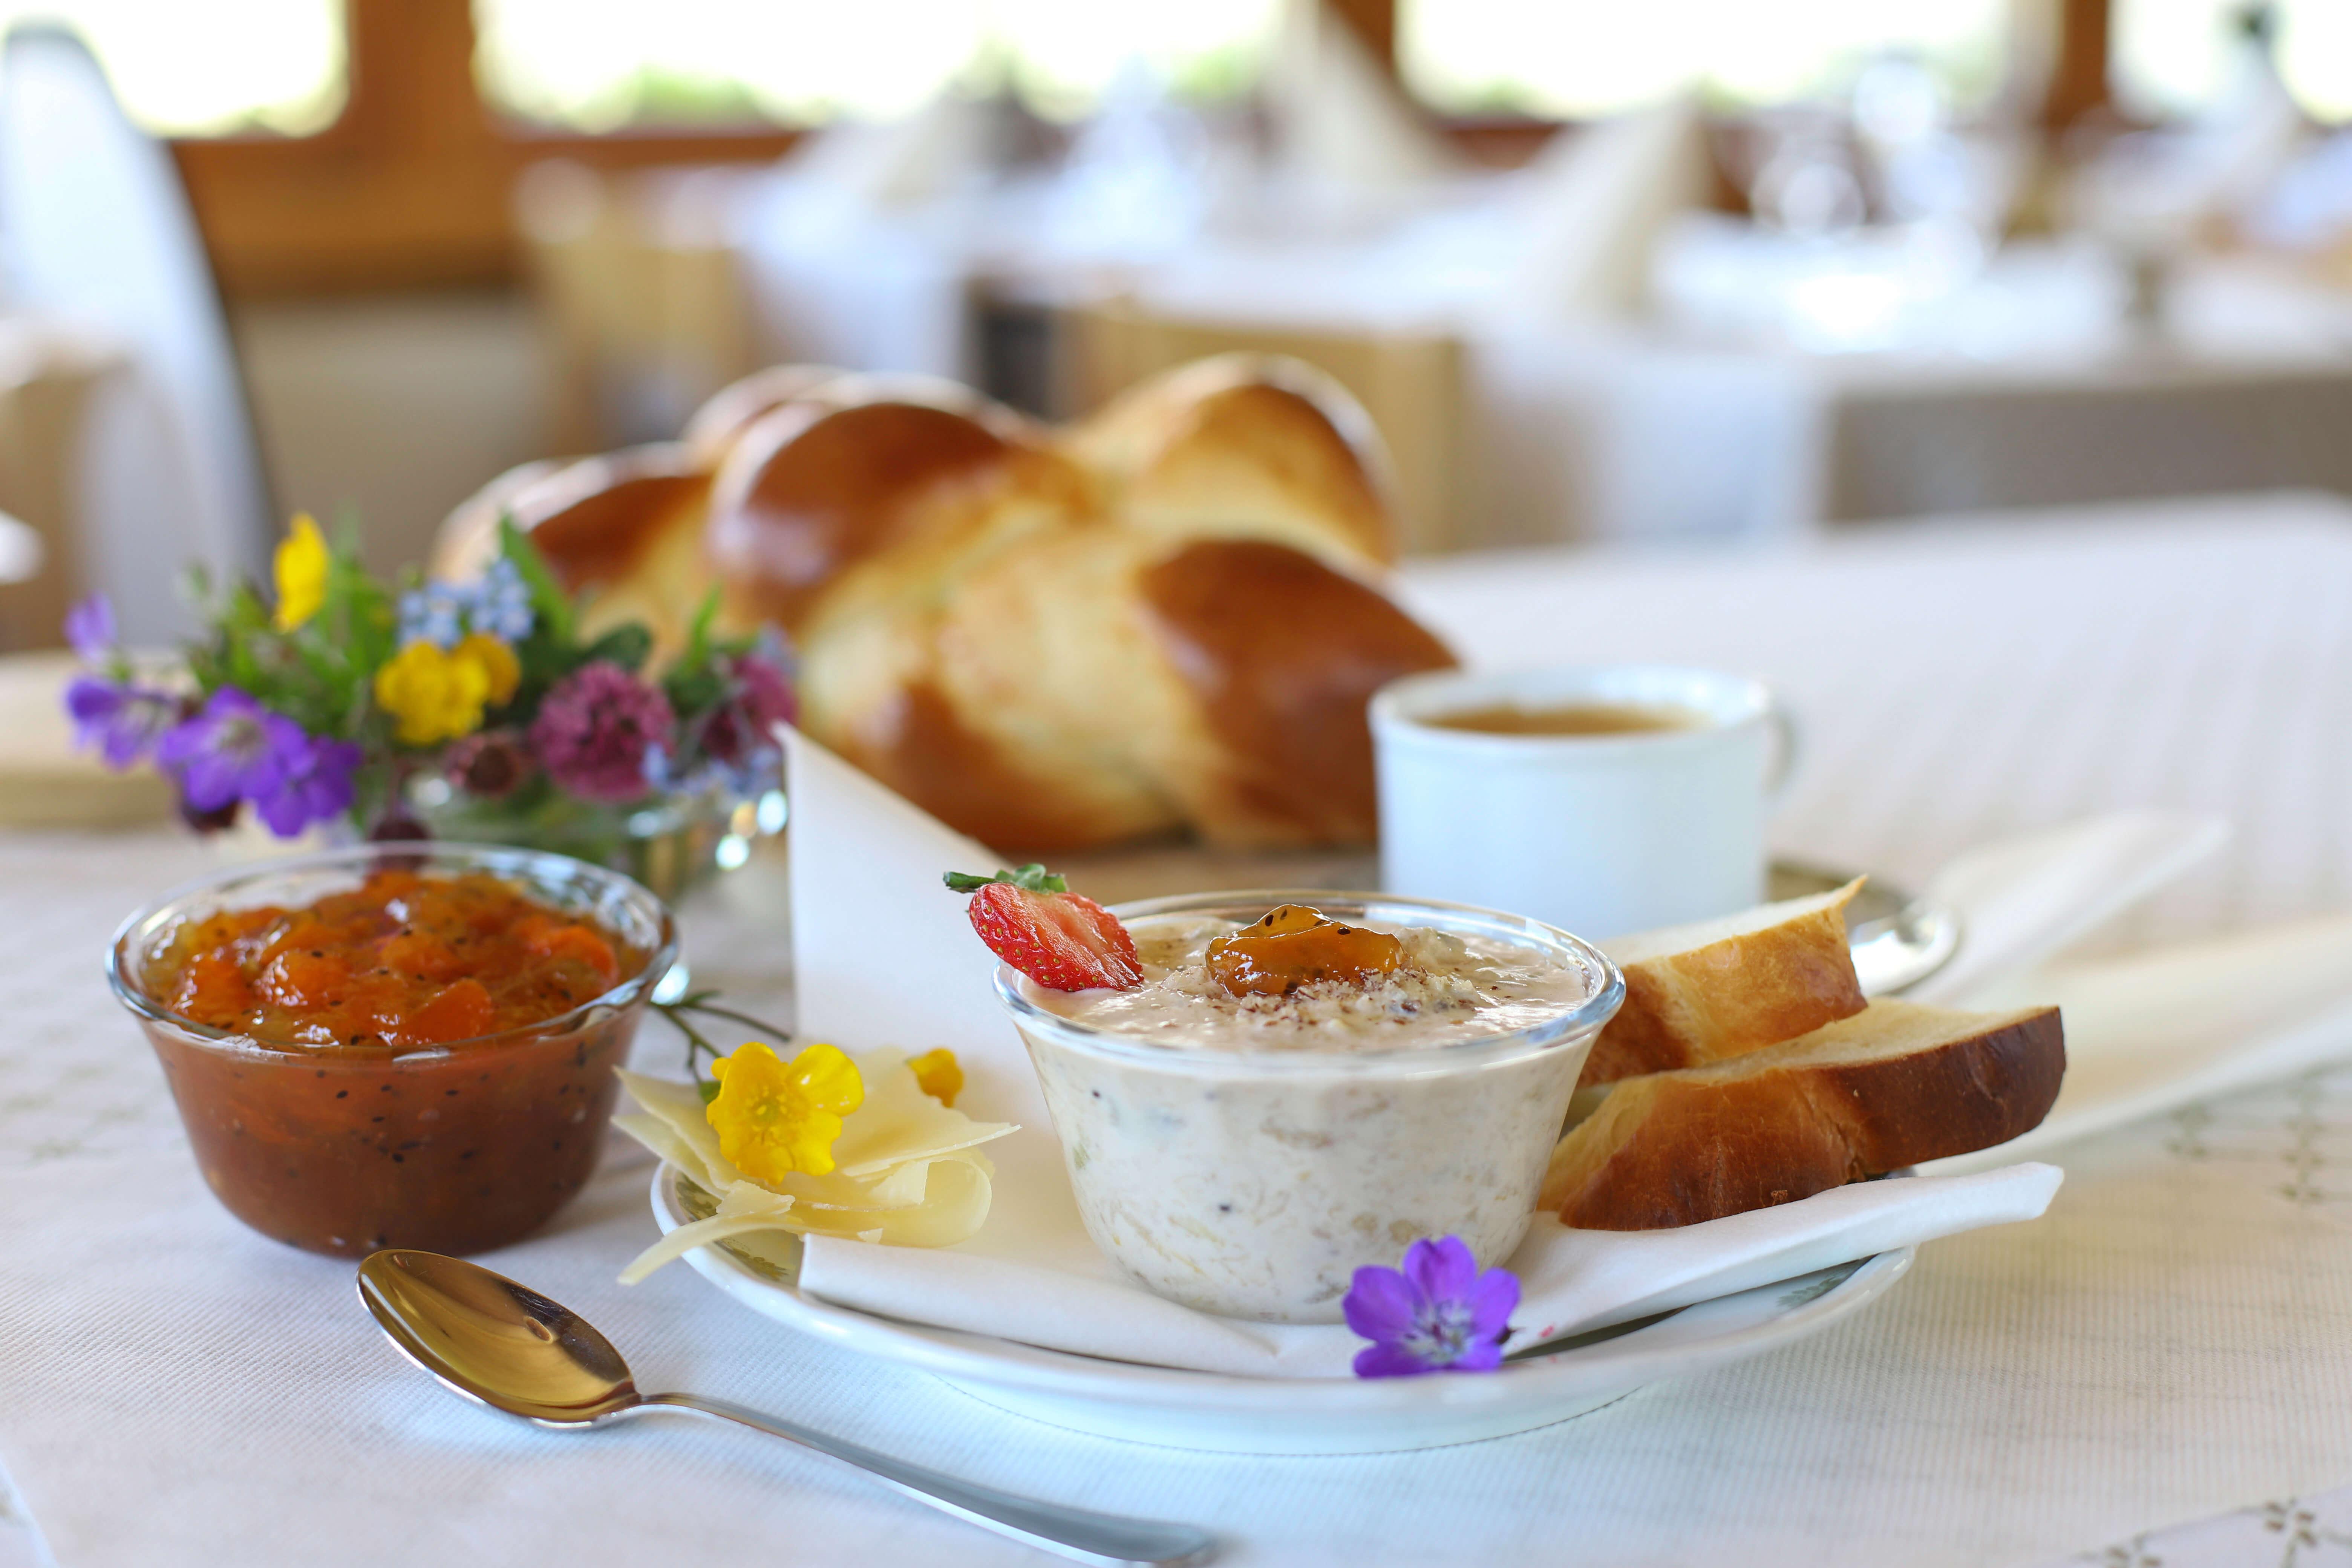 Bärglizmorge Frühstück Zopf Müsli Diemtigbergli